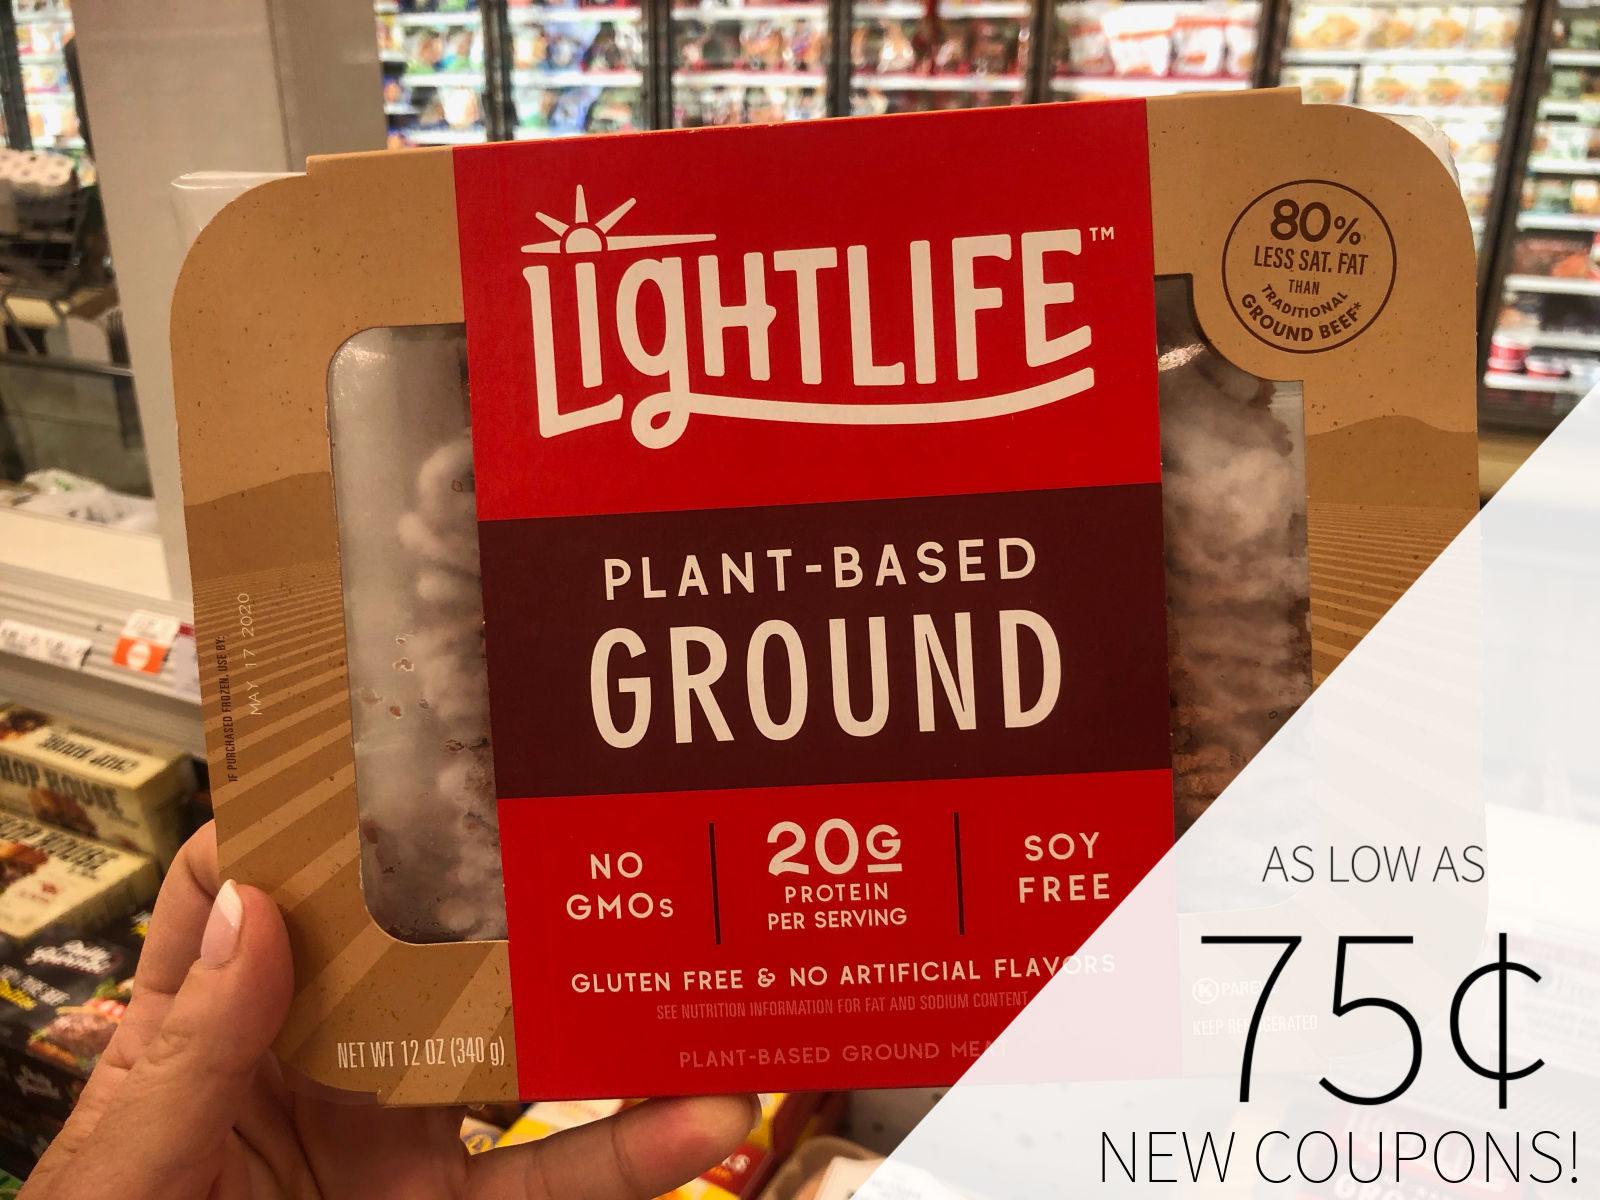 Lightlife Meatless Veggie Burger And Plant-Based Ground At A Fantastic Price At Publix on I Heart Publix 1